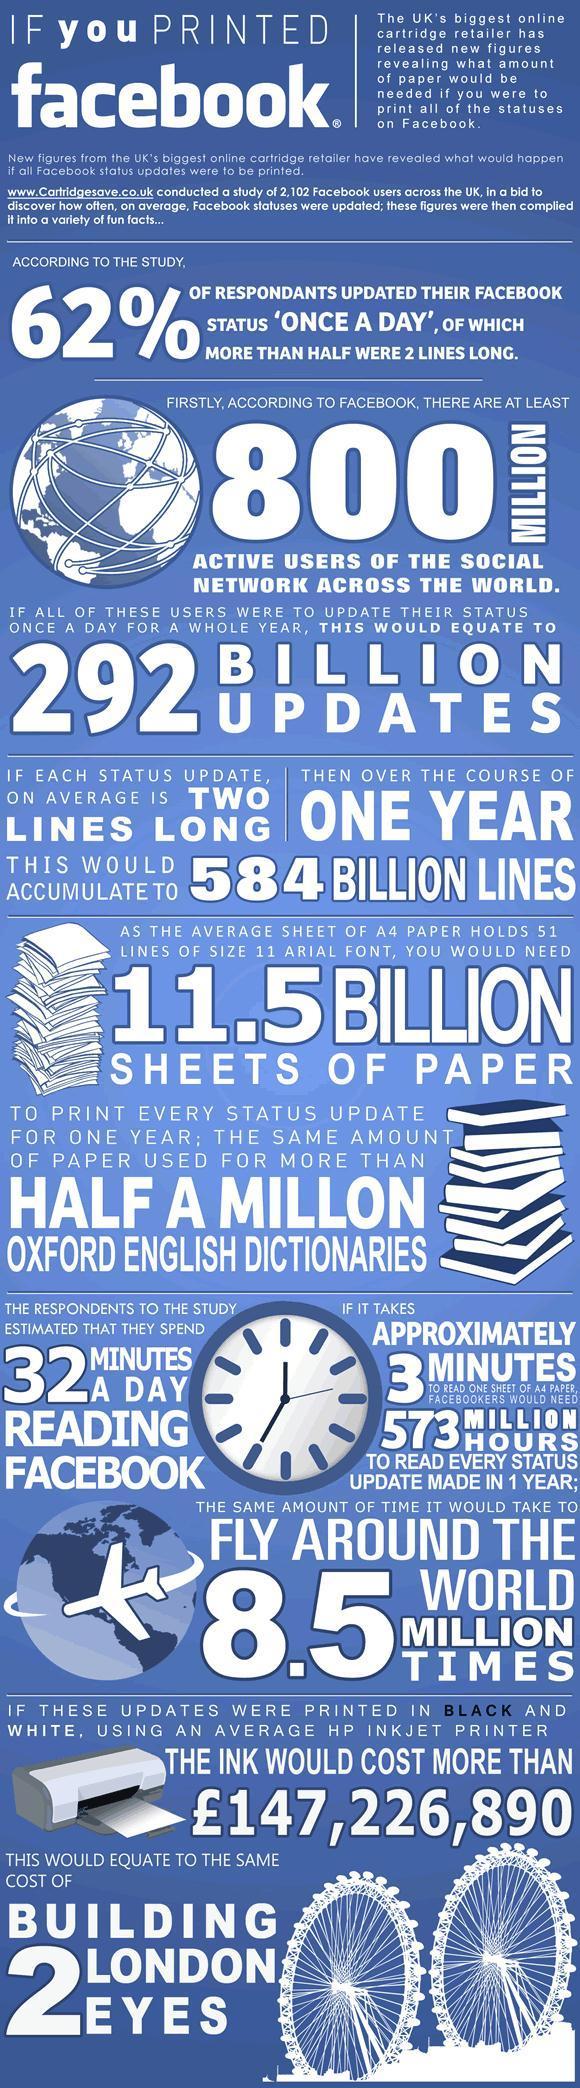 If you printed Facebook... (image © Cartridgesave)